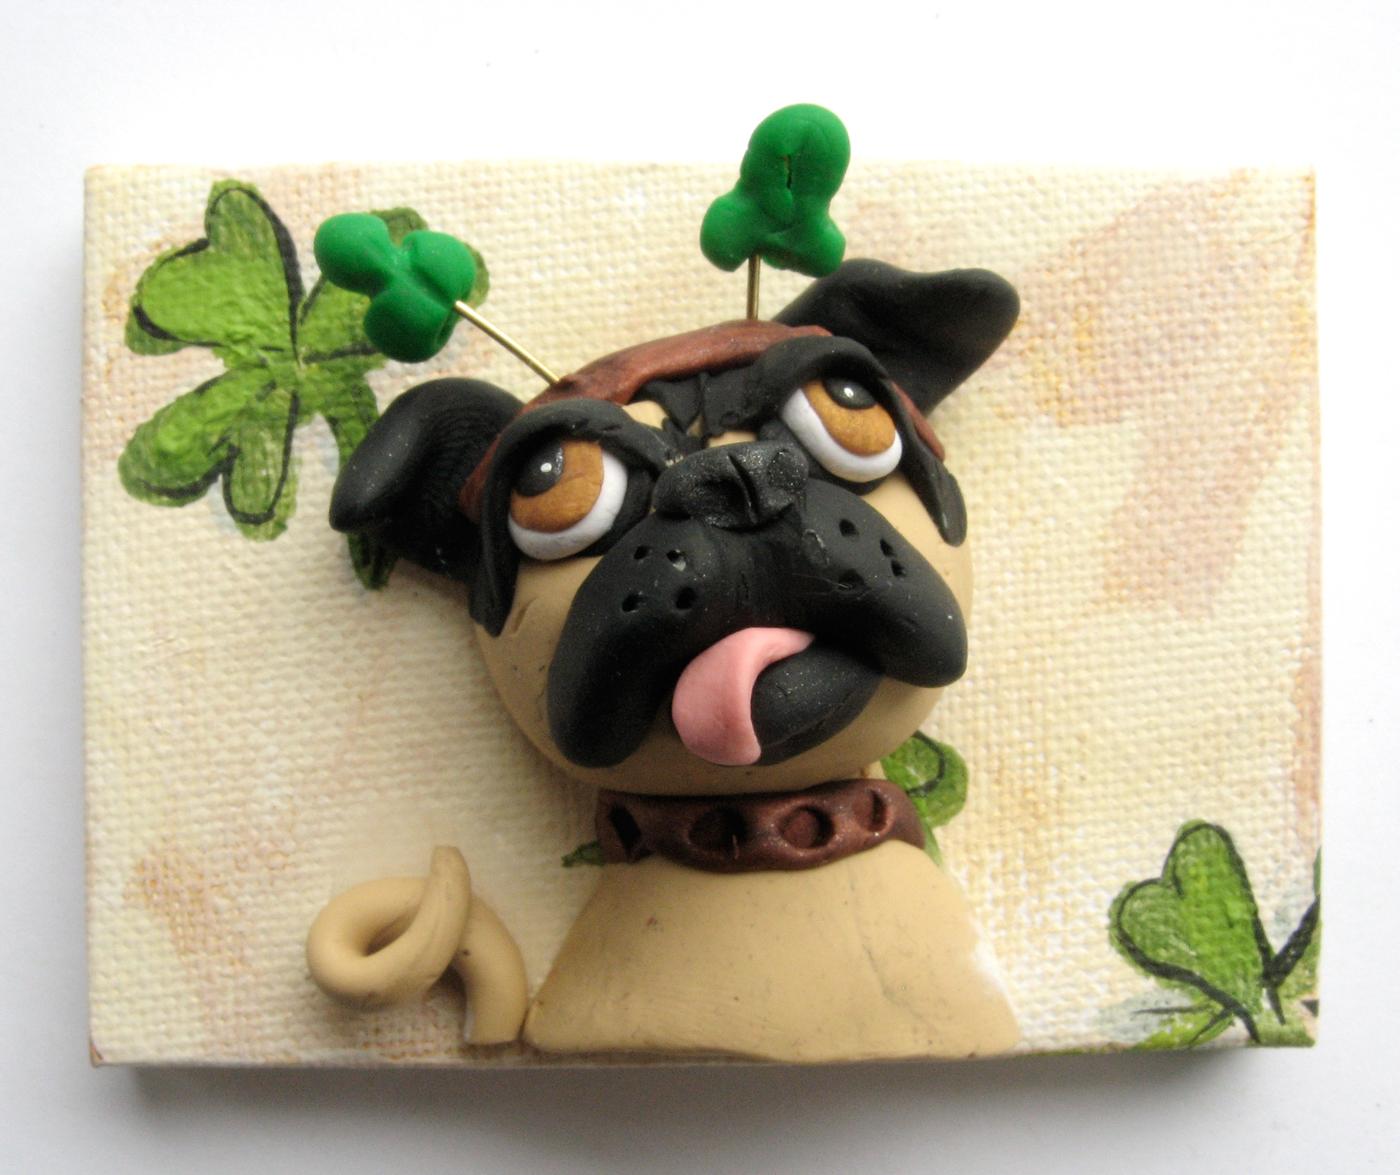 Alison_E_kurek_St._Patrick's_Day_Pug_1